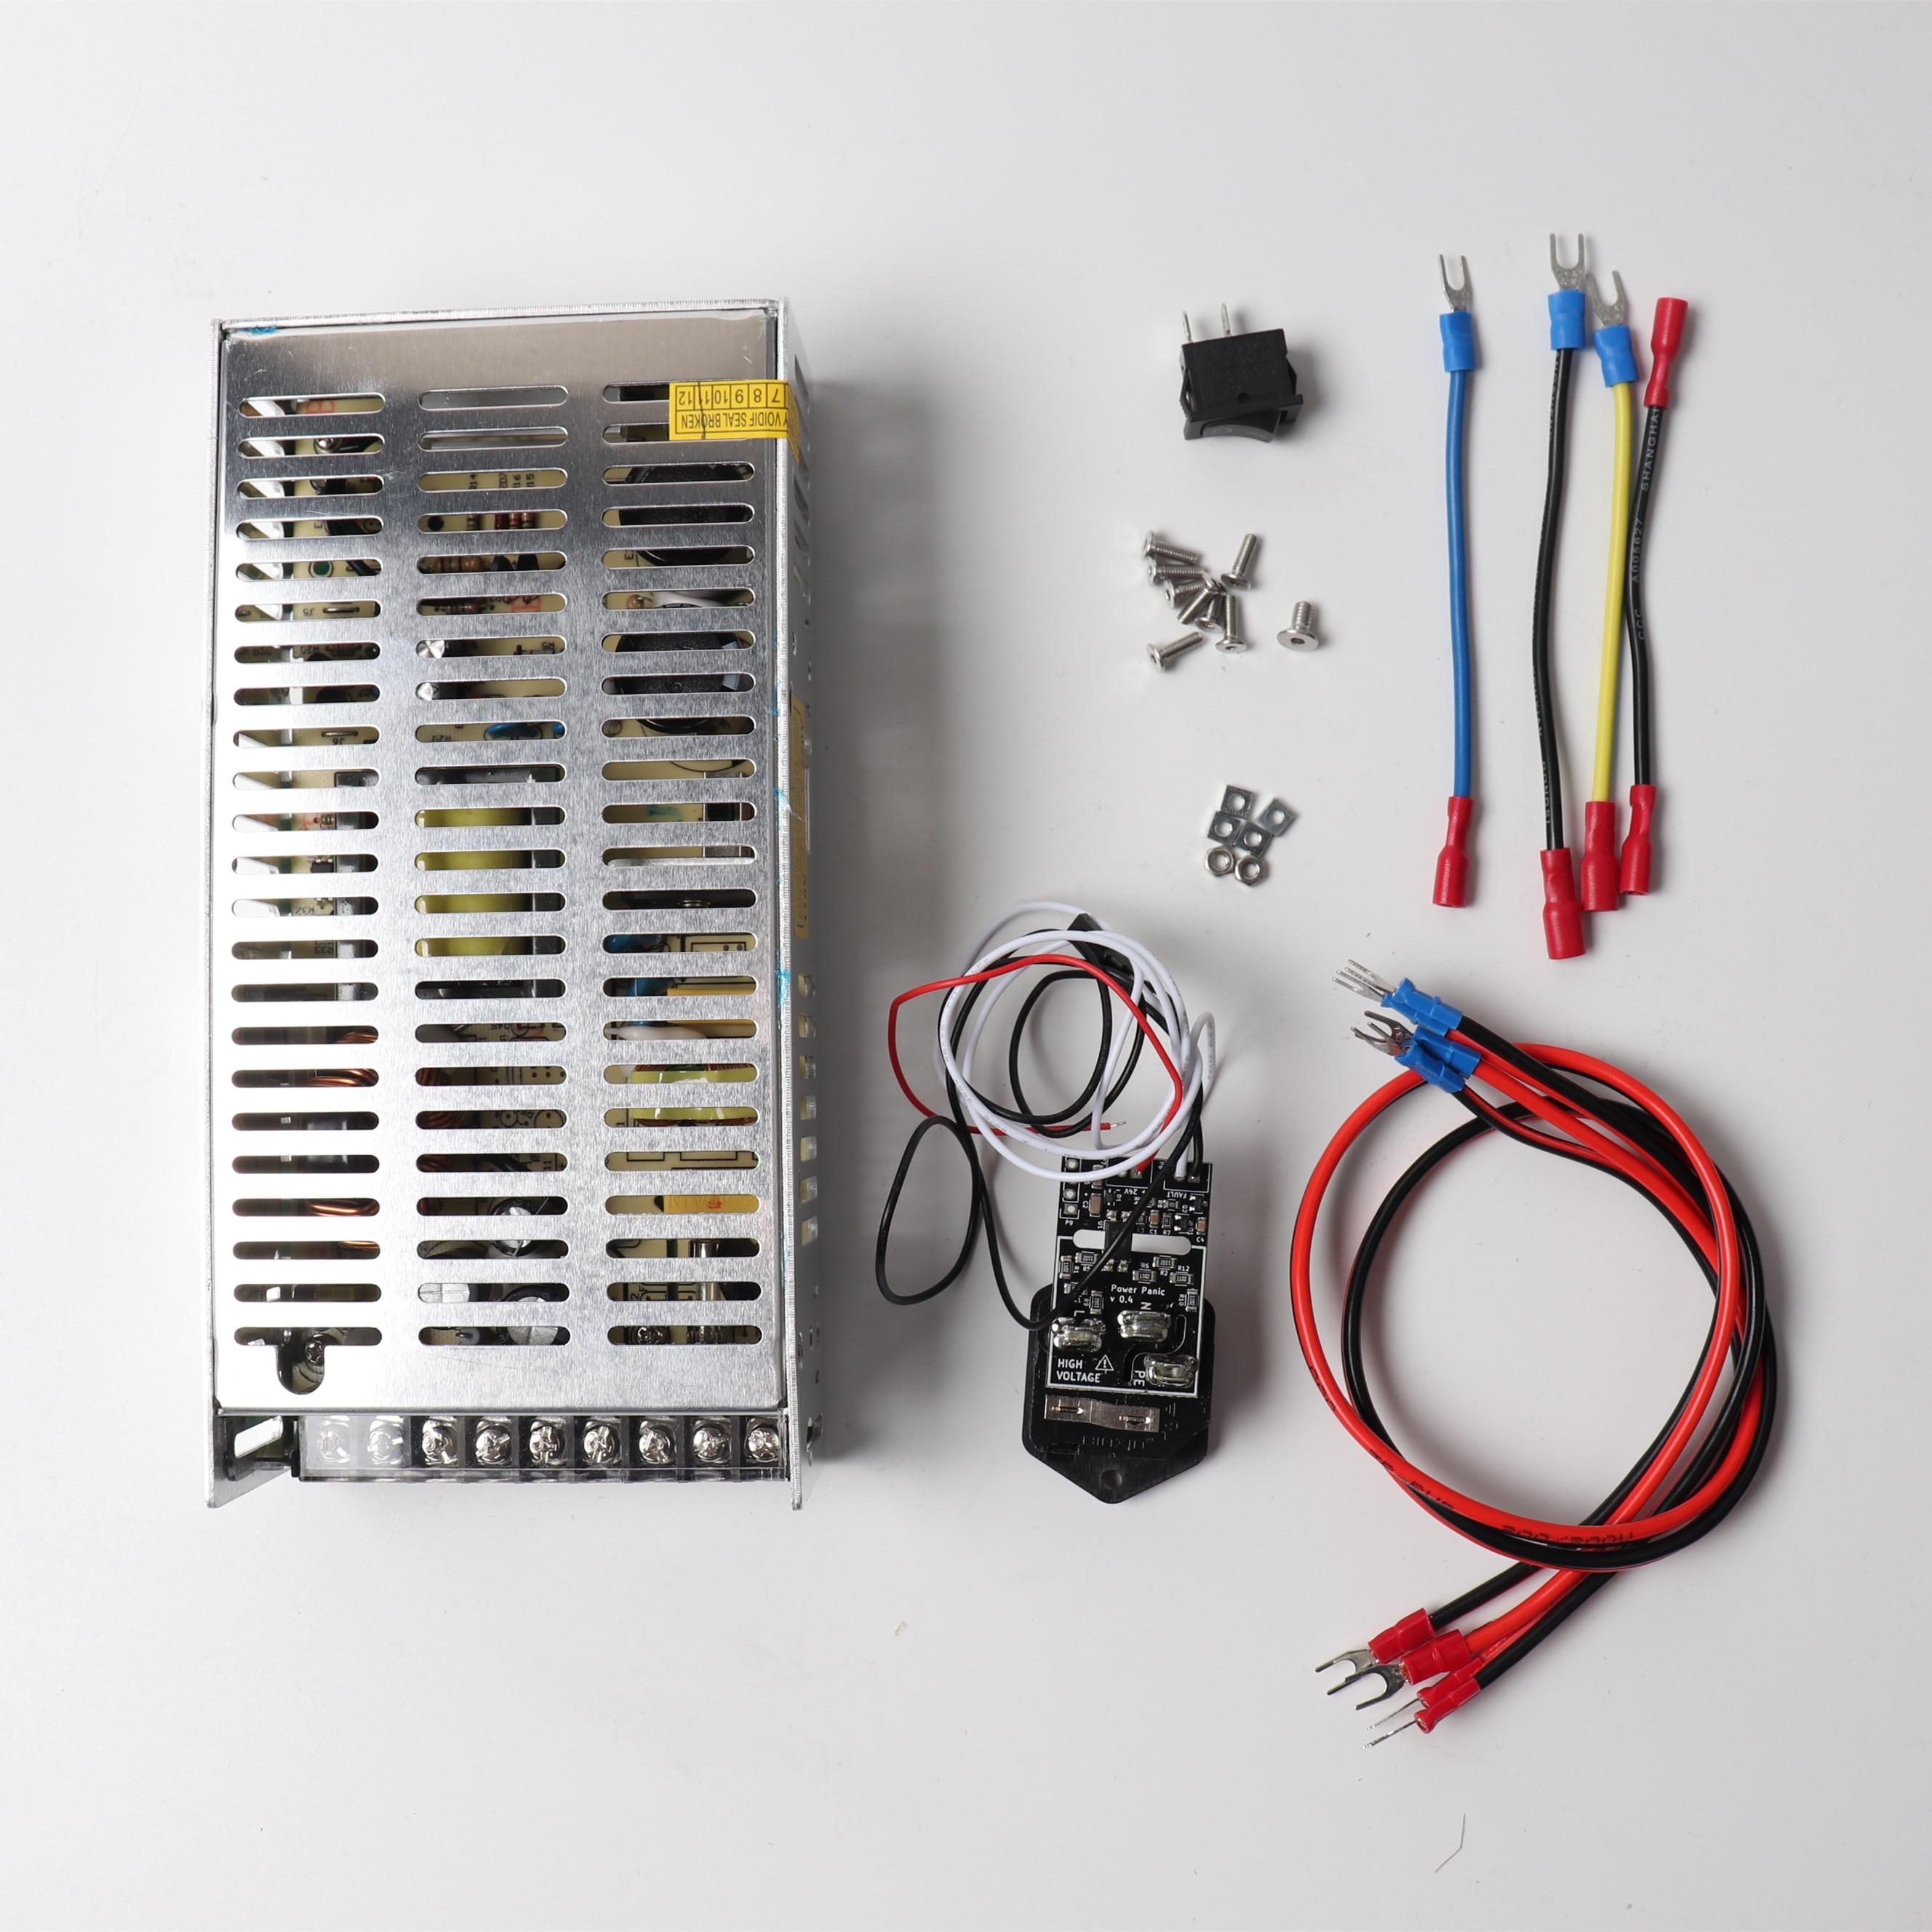 Blurolls Prusa i3 MK3 PSU power supply 24V, 24W, power panic, wiring harness and switch